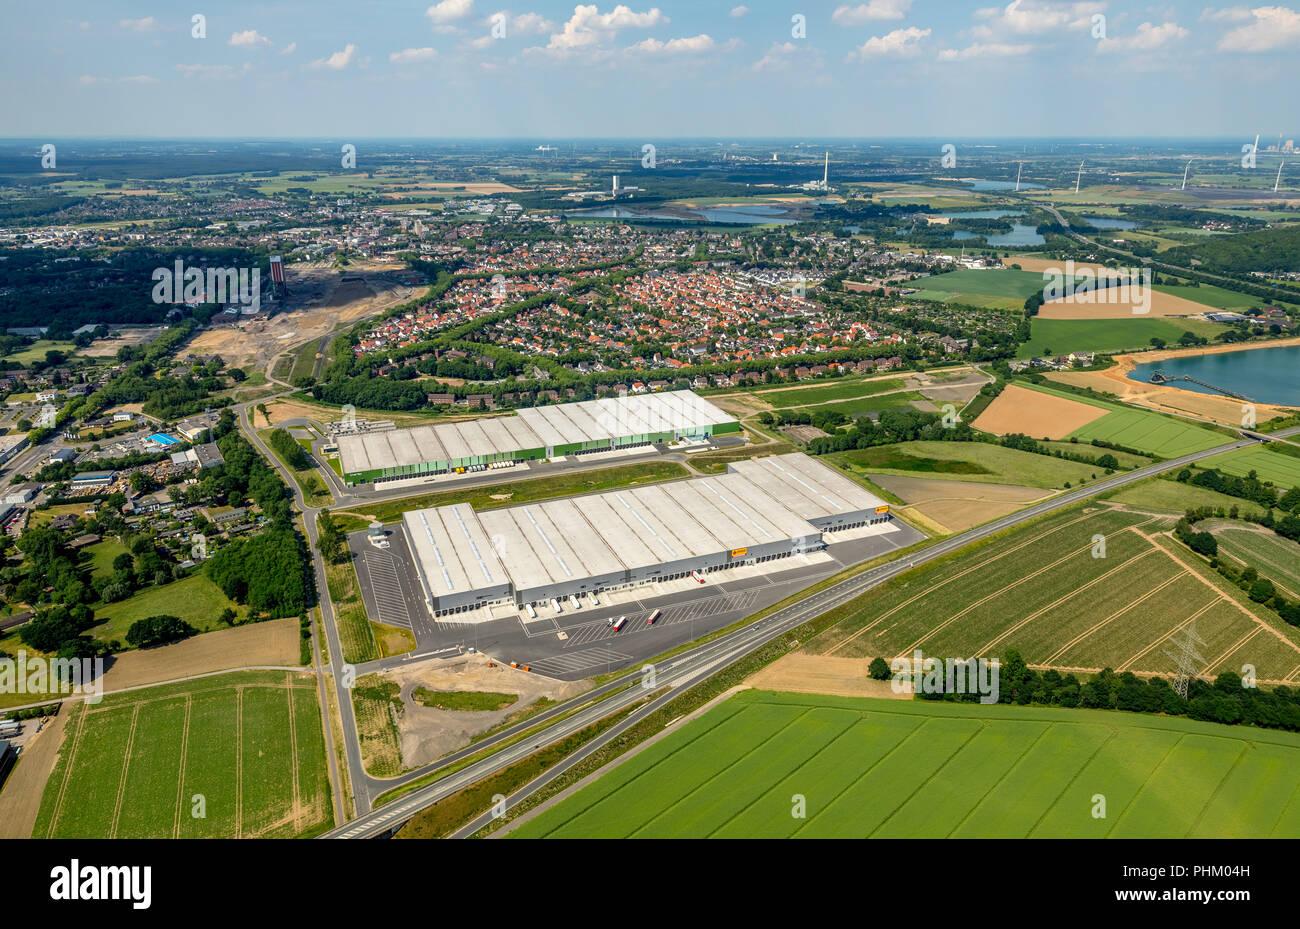 Aerial view, logistics location Logport 6 in Kamp-Lintfort, former coal storage site, belongs to Duisport - Duisburger Hafen, warehouses for truck han - Stock Image